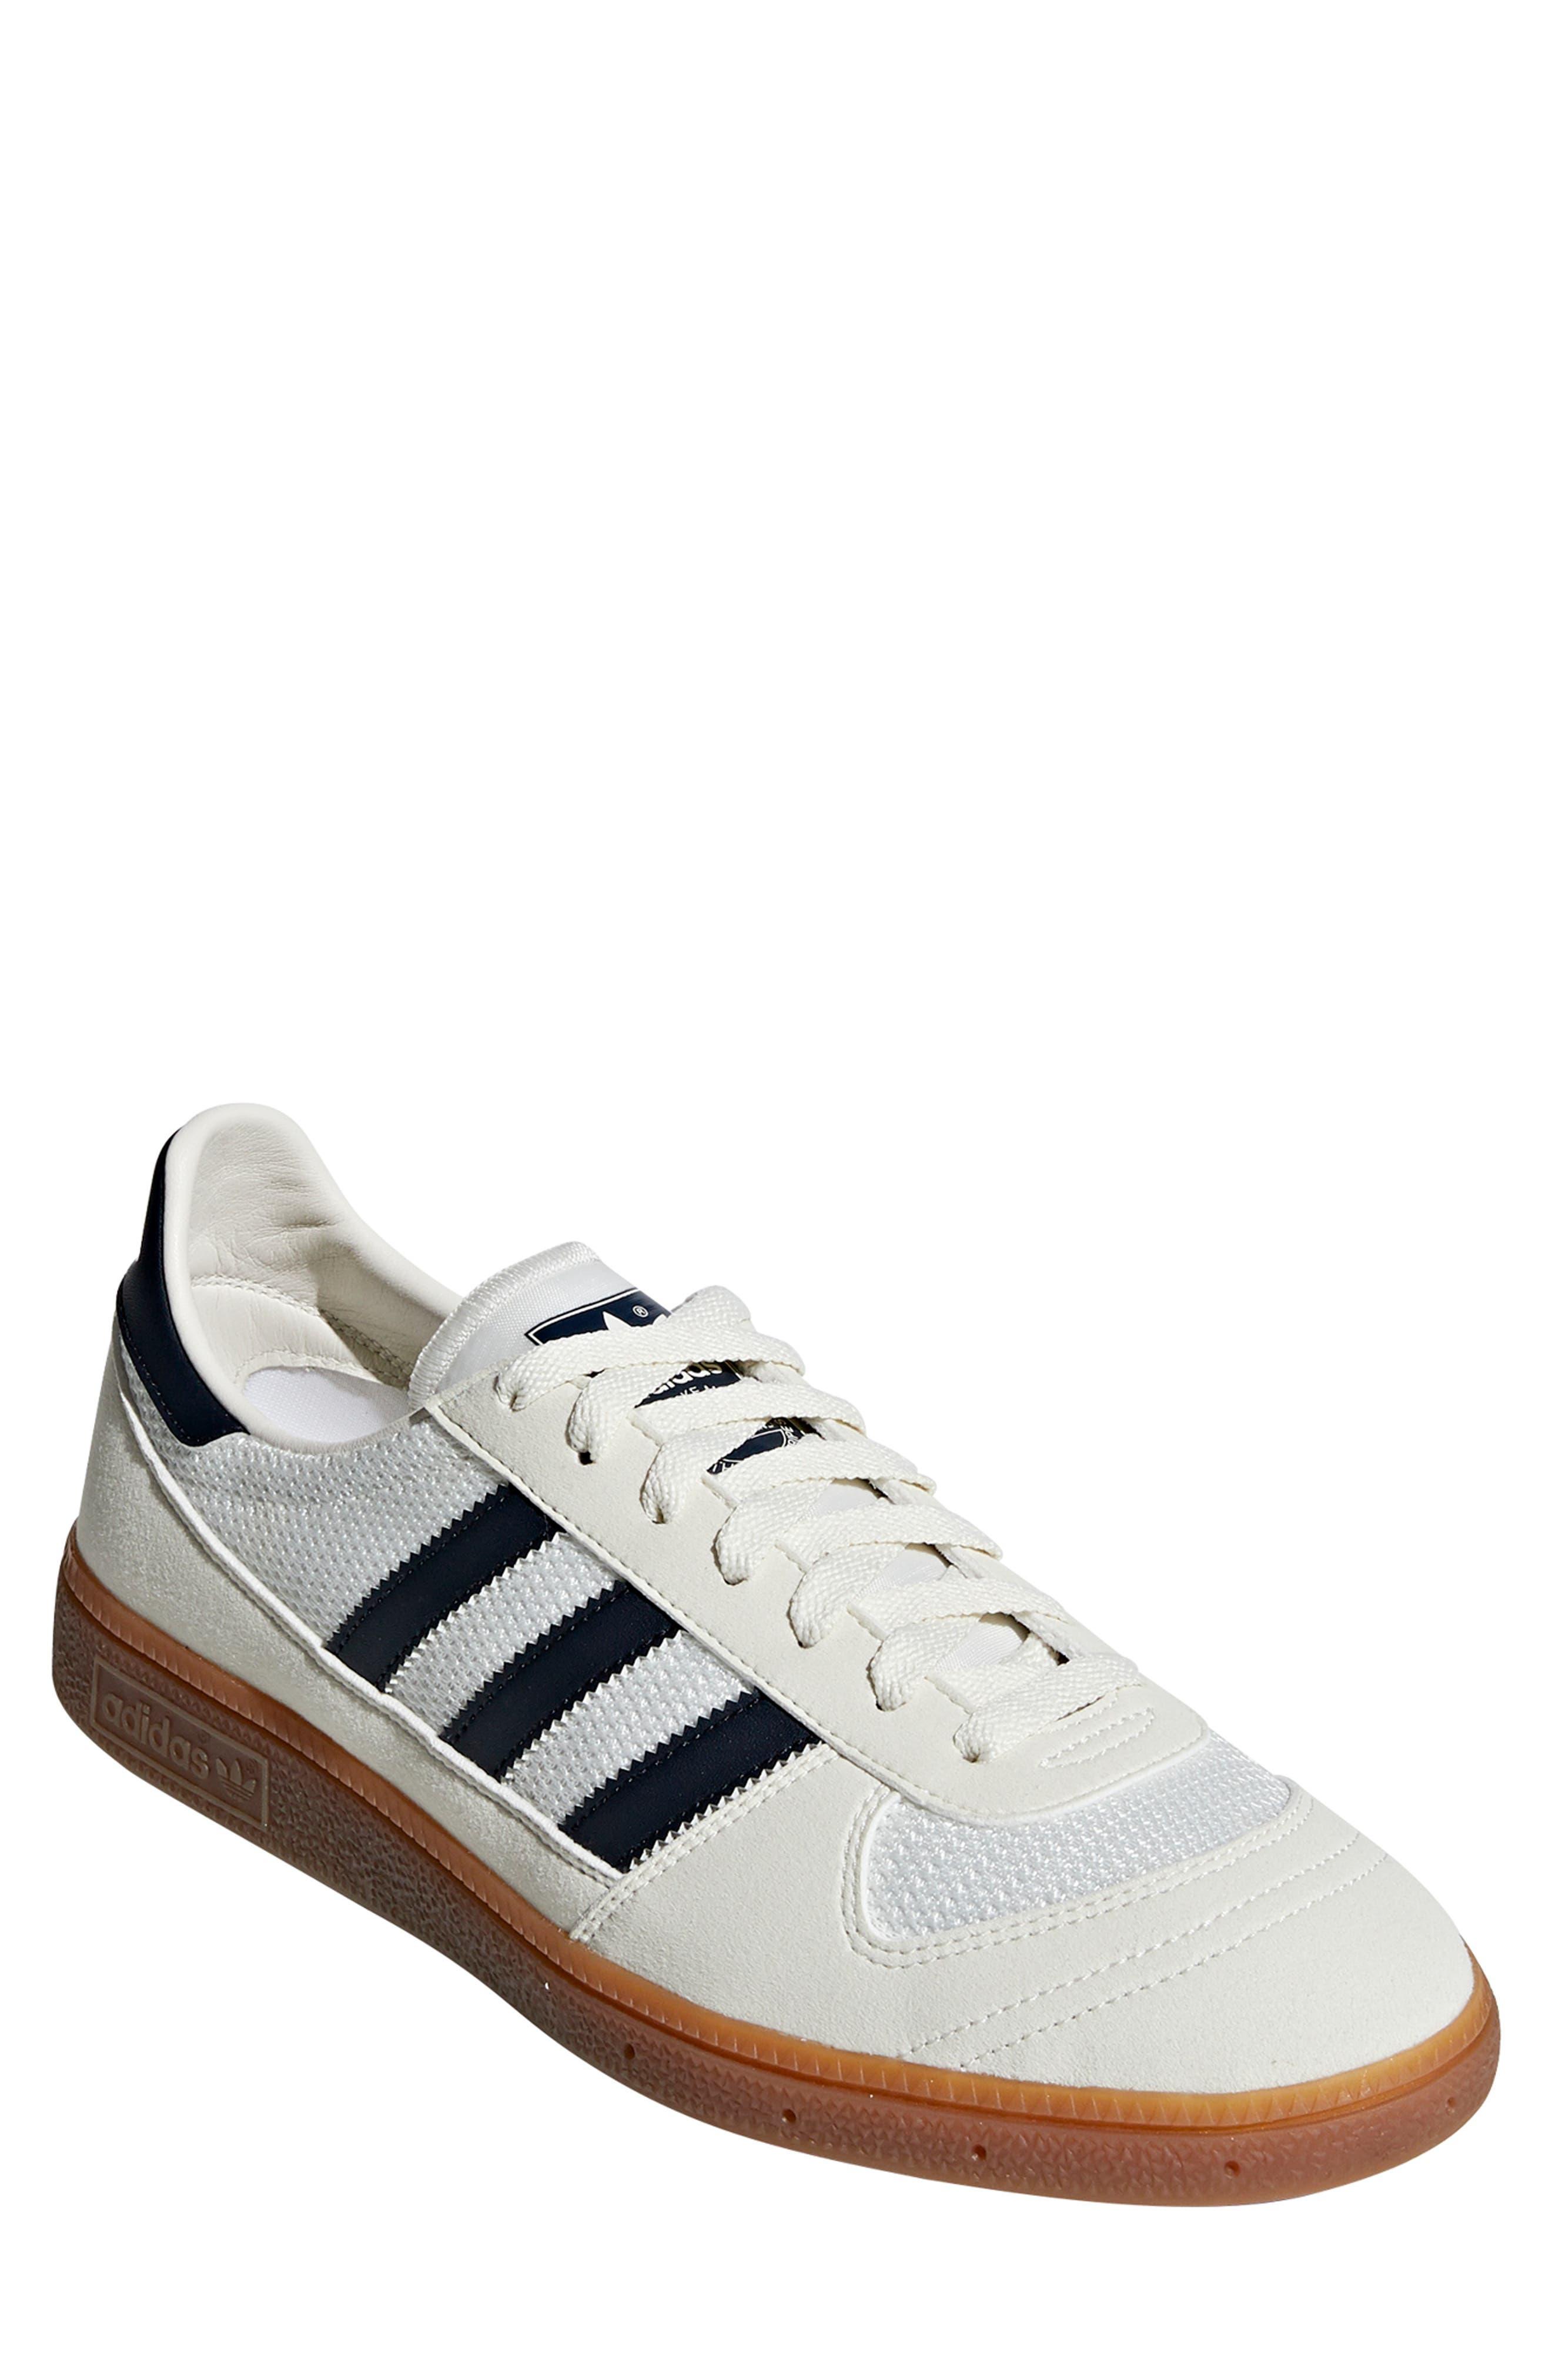 Wilsy SPZL Sneaker,                         Main,                         color, OFF WHITE/ NIGHT NAVY